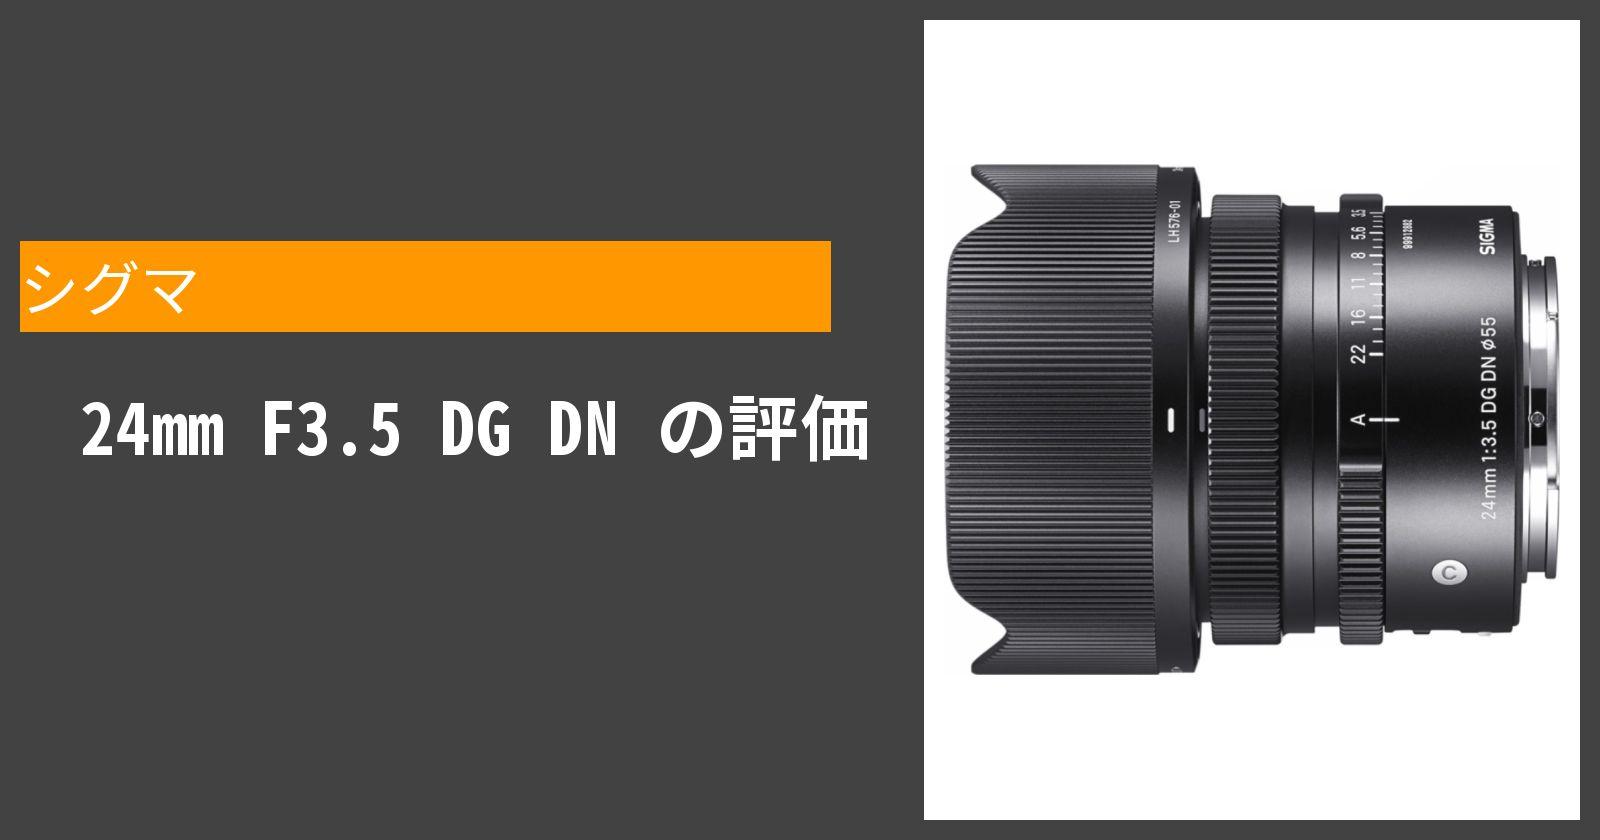 24mm F3.5 DG DNを徹底評価